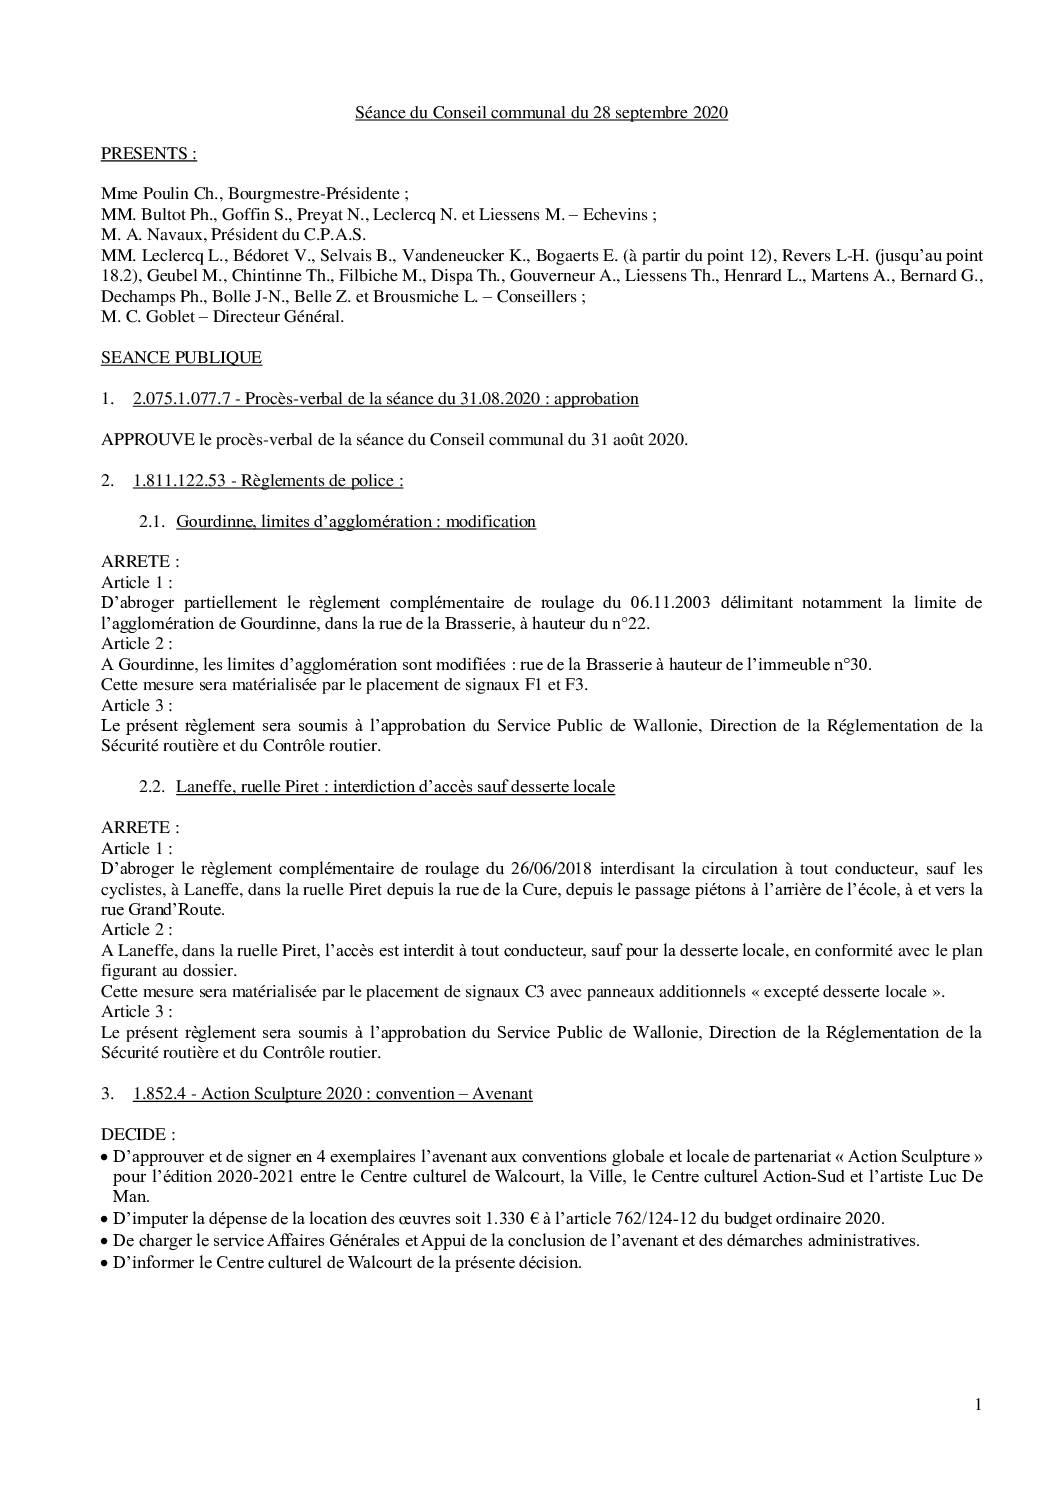 Conseil communal – 28 septembre 2020